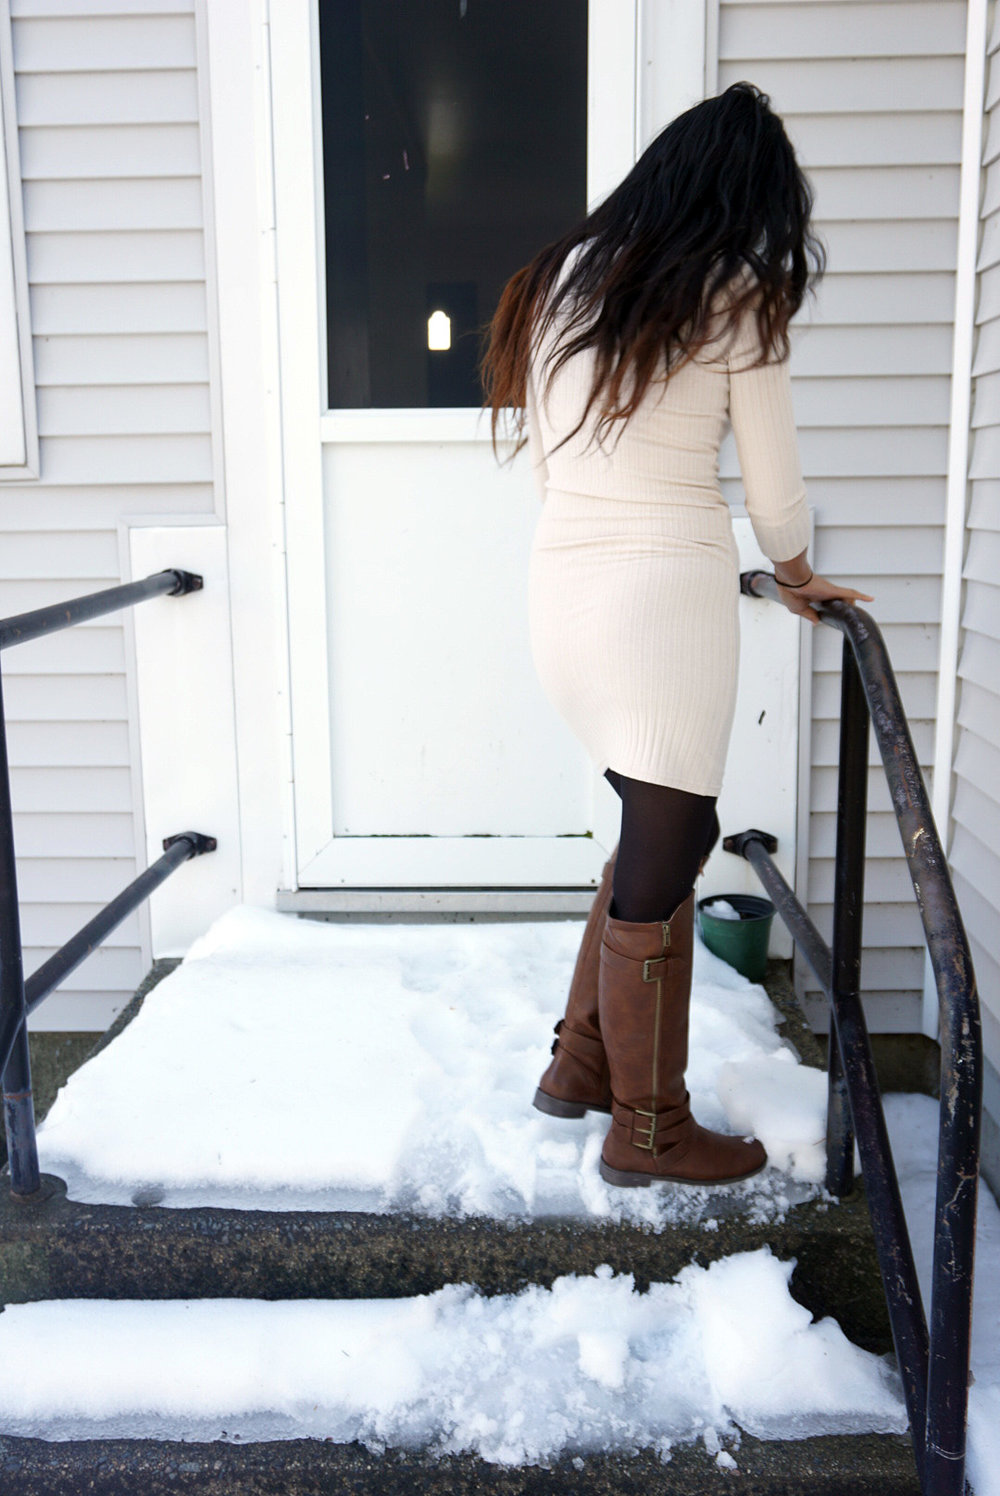 White-Dress-Caramel-Cardigan-Transitioning-To-Spring-Fashionista-Blogger-Style-LINDATENCHITRAN-6-1080x1616.jpg